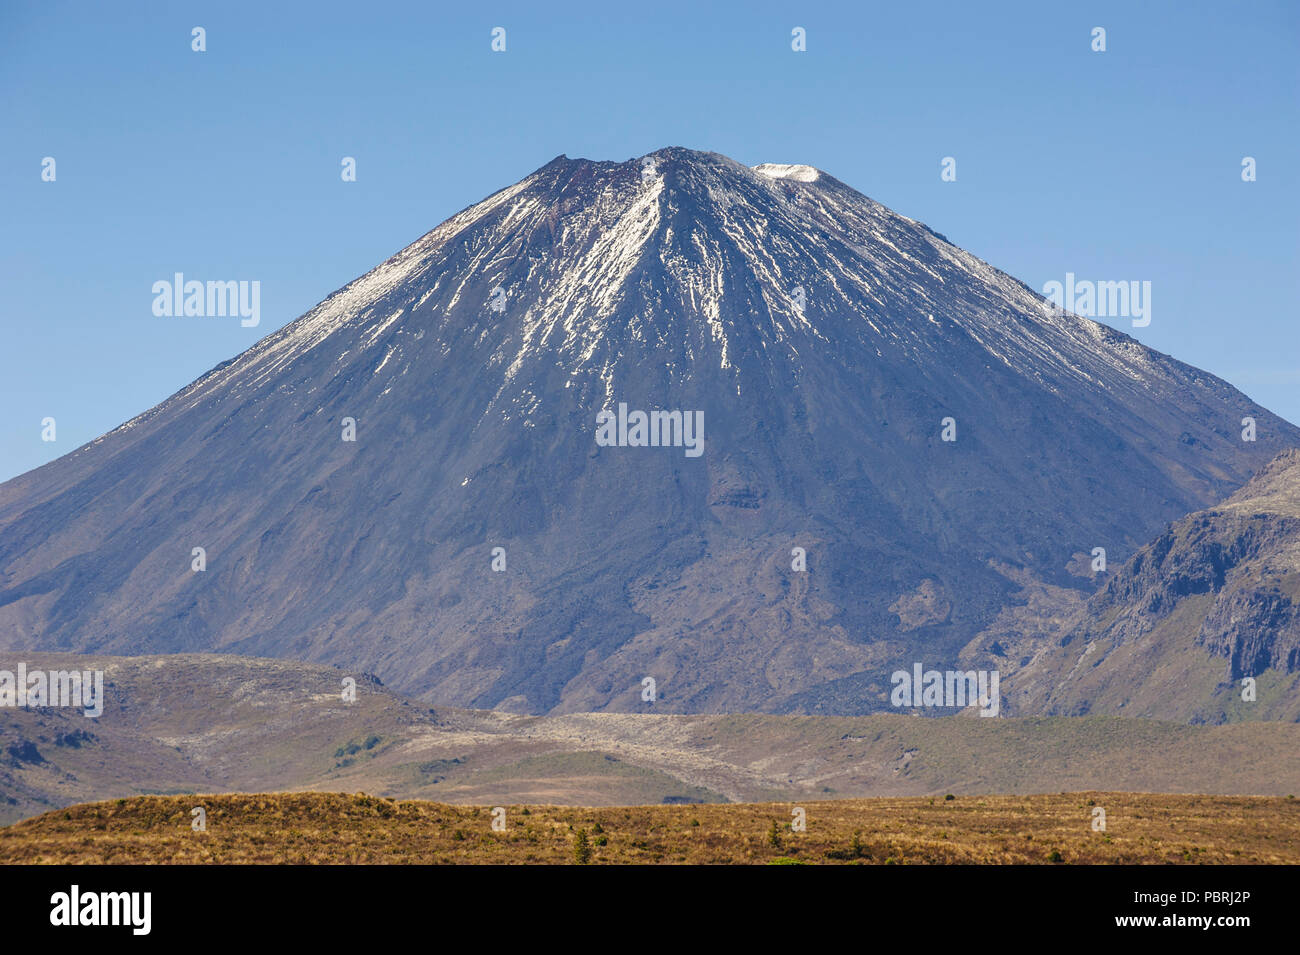 Mount Ngauruhoe, Unesco world heritage sight Tongariro National Park, North Island, New Zealand - Stock Image